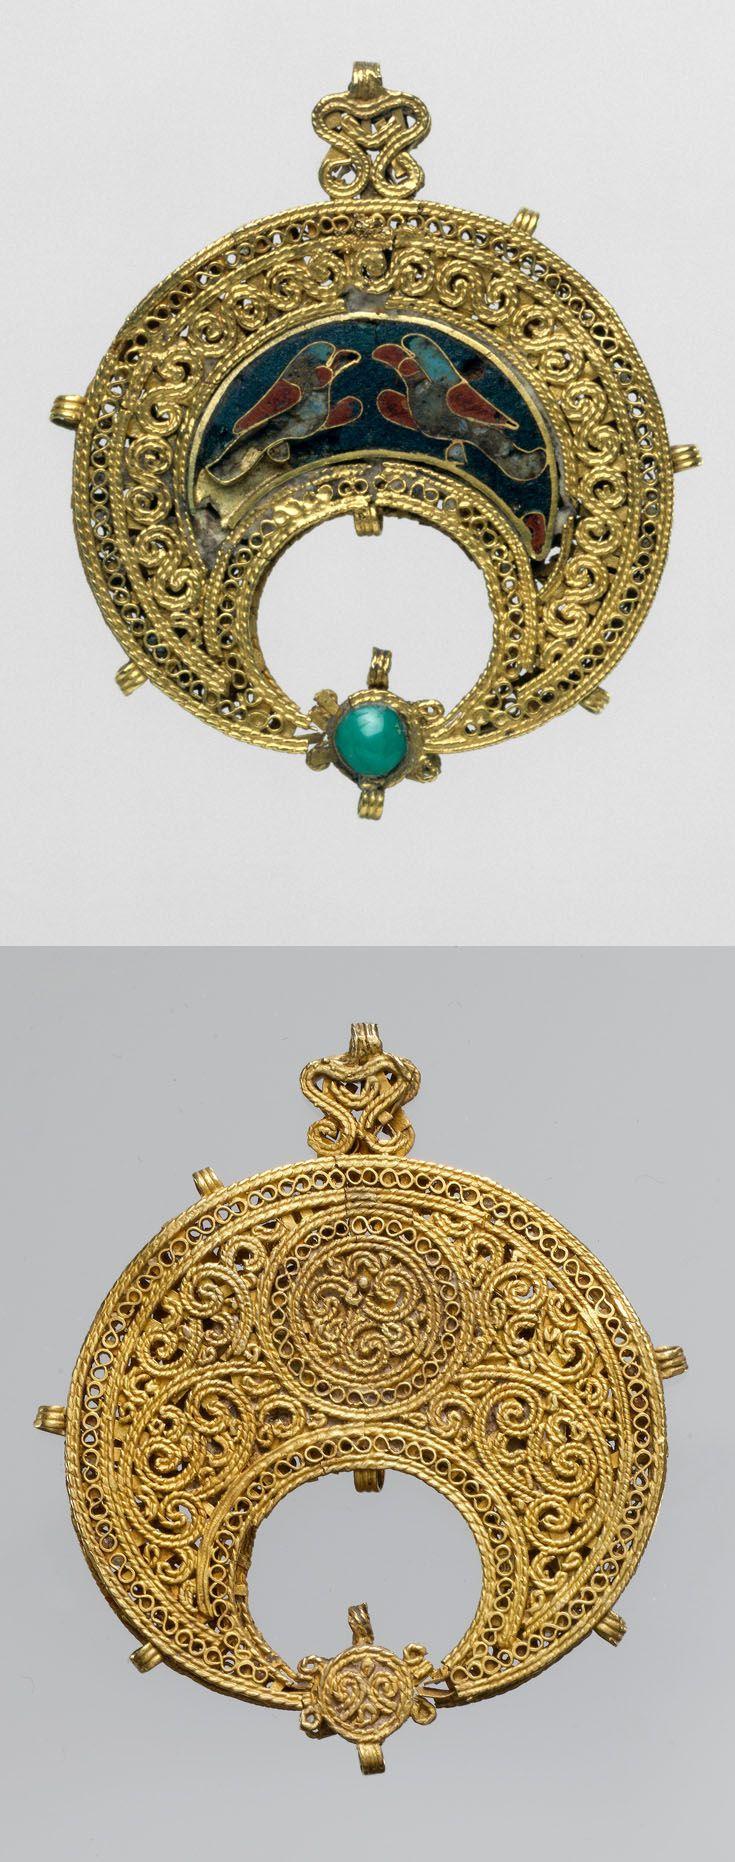 Egypt   Islamic crescent-shaped pendant; gold,  cloisonné enamel, turquoise   ca. 11th century